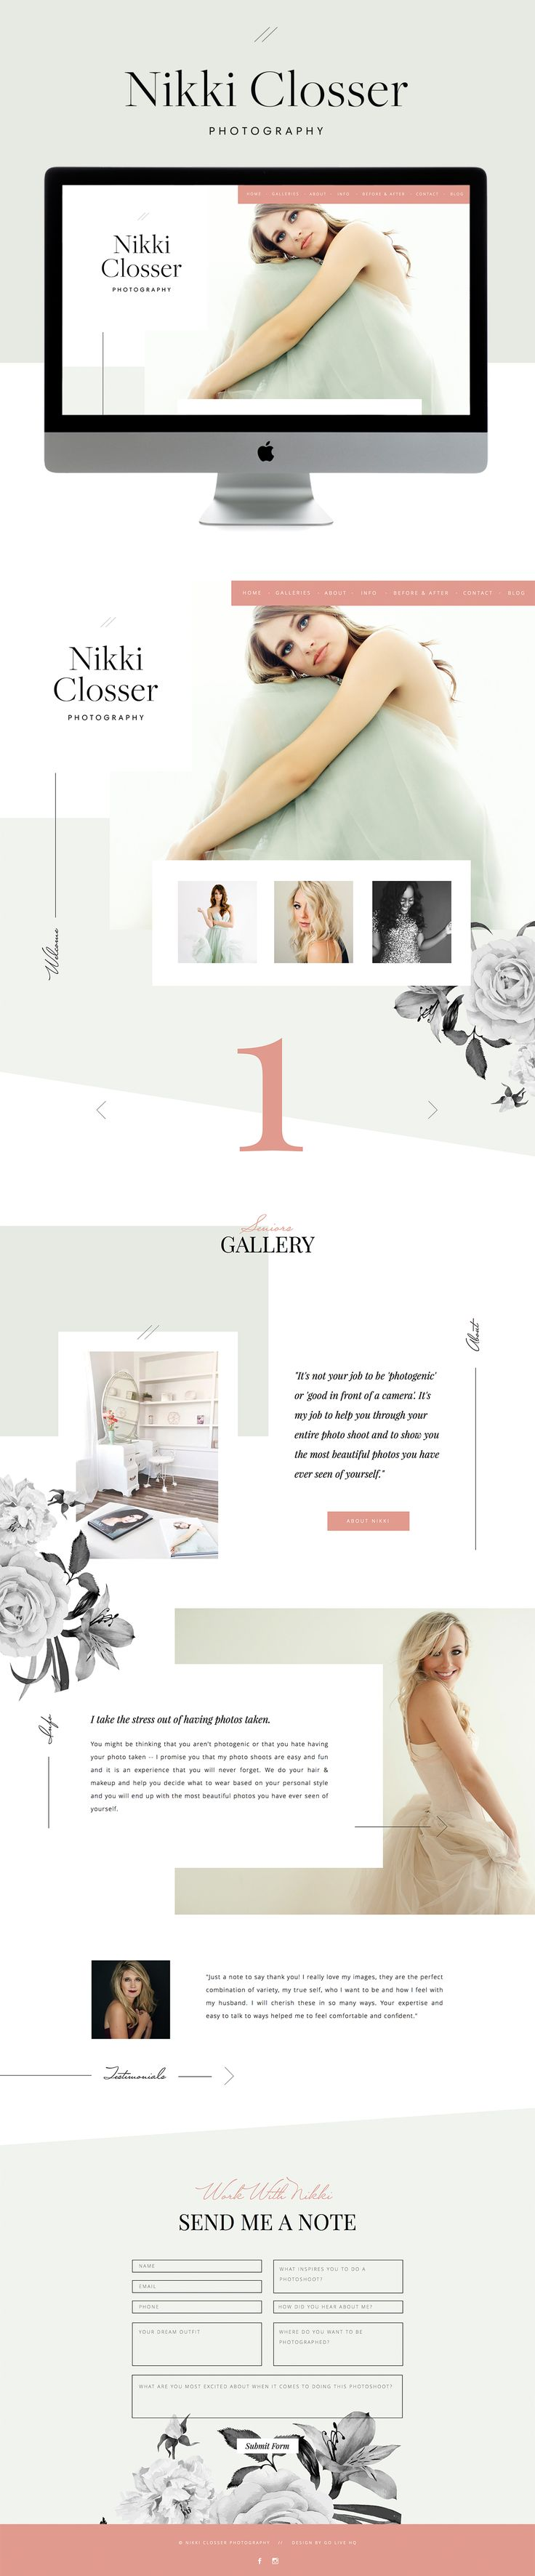 pretty, elegant & friendly showit website design | designed by: golivehq.co